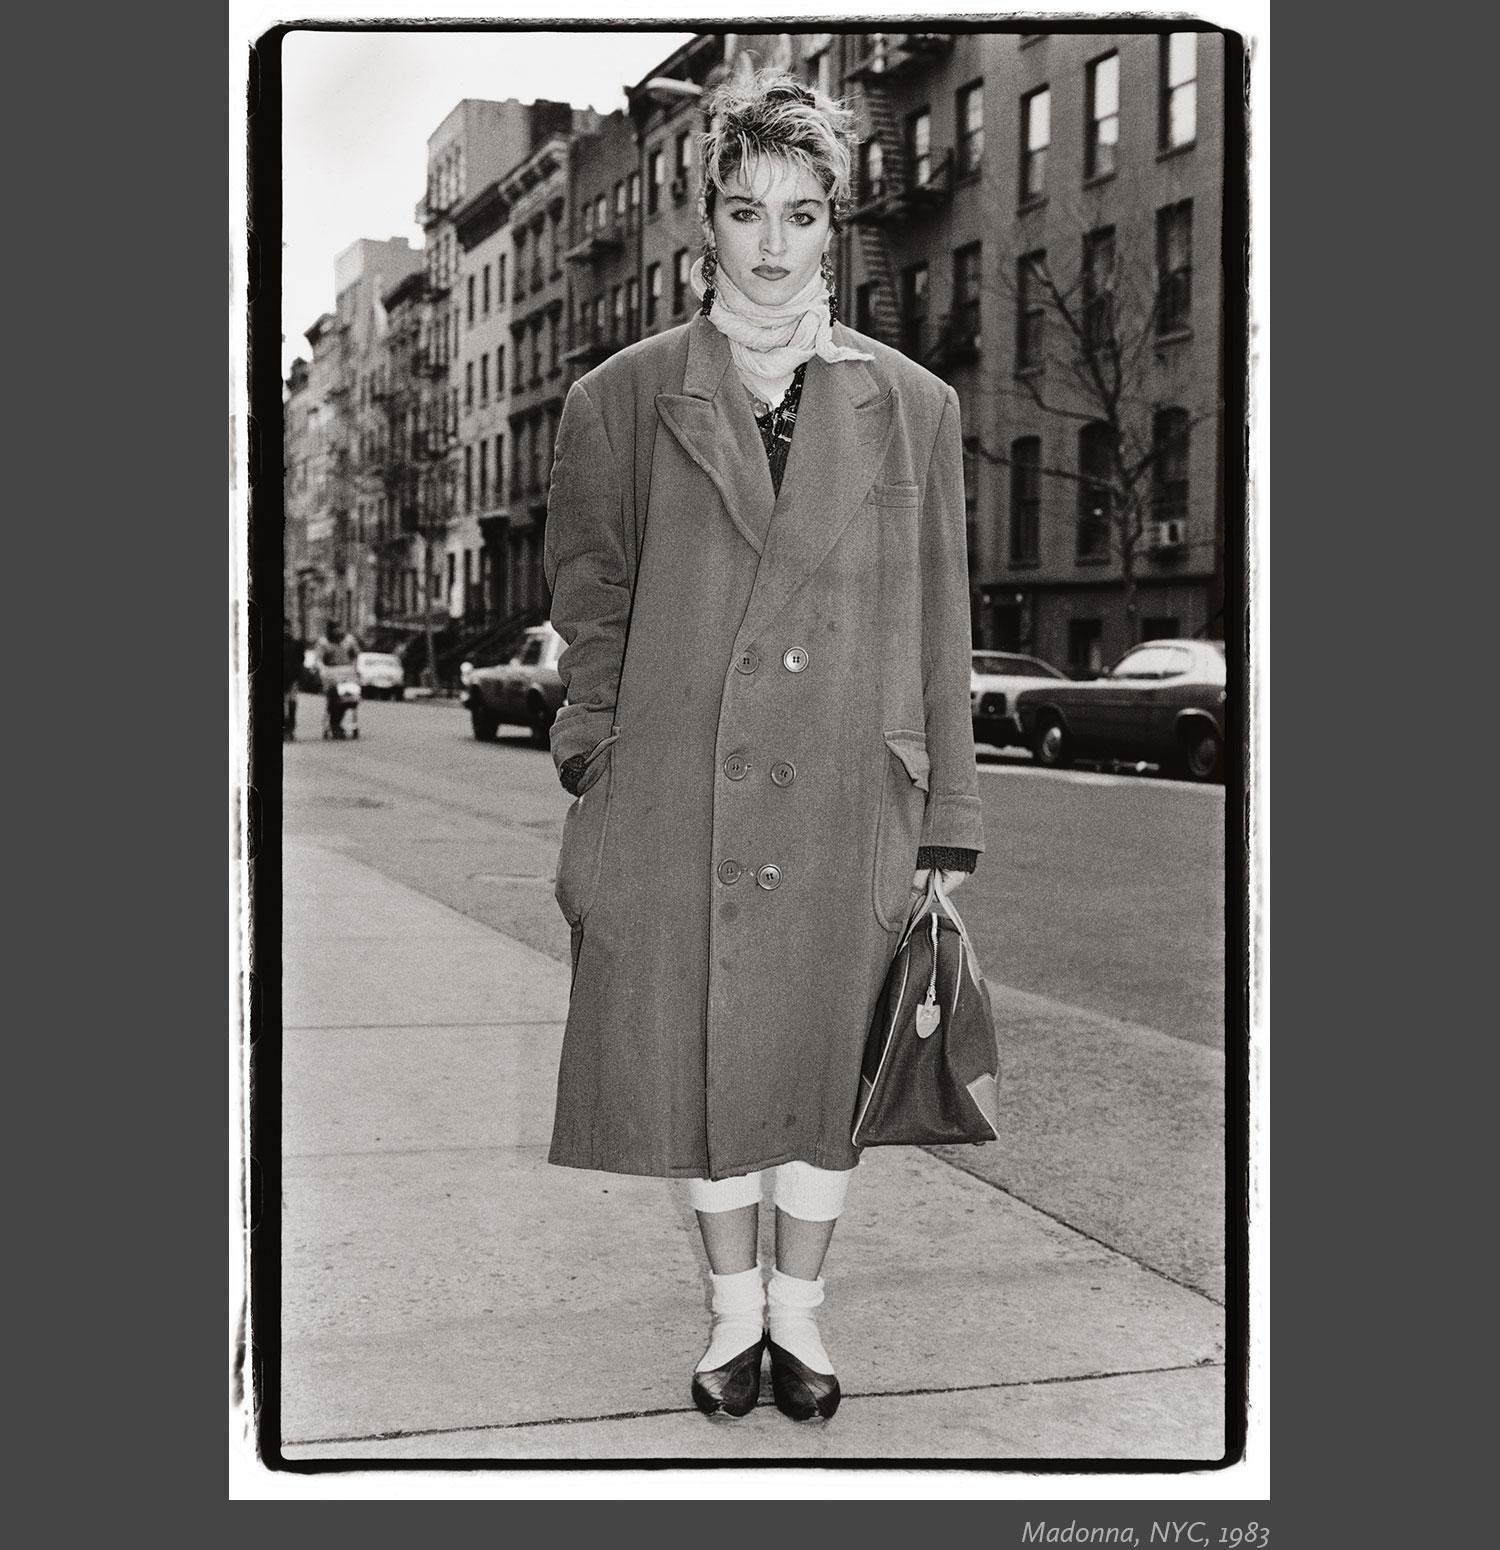 21_Madonna,-NYC,-1983.jpg